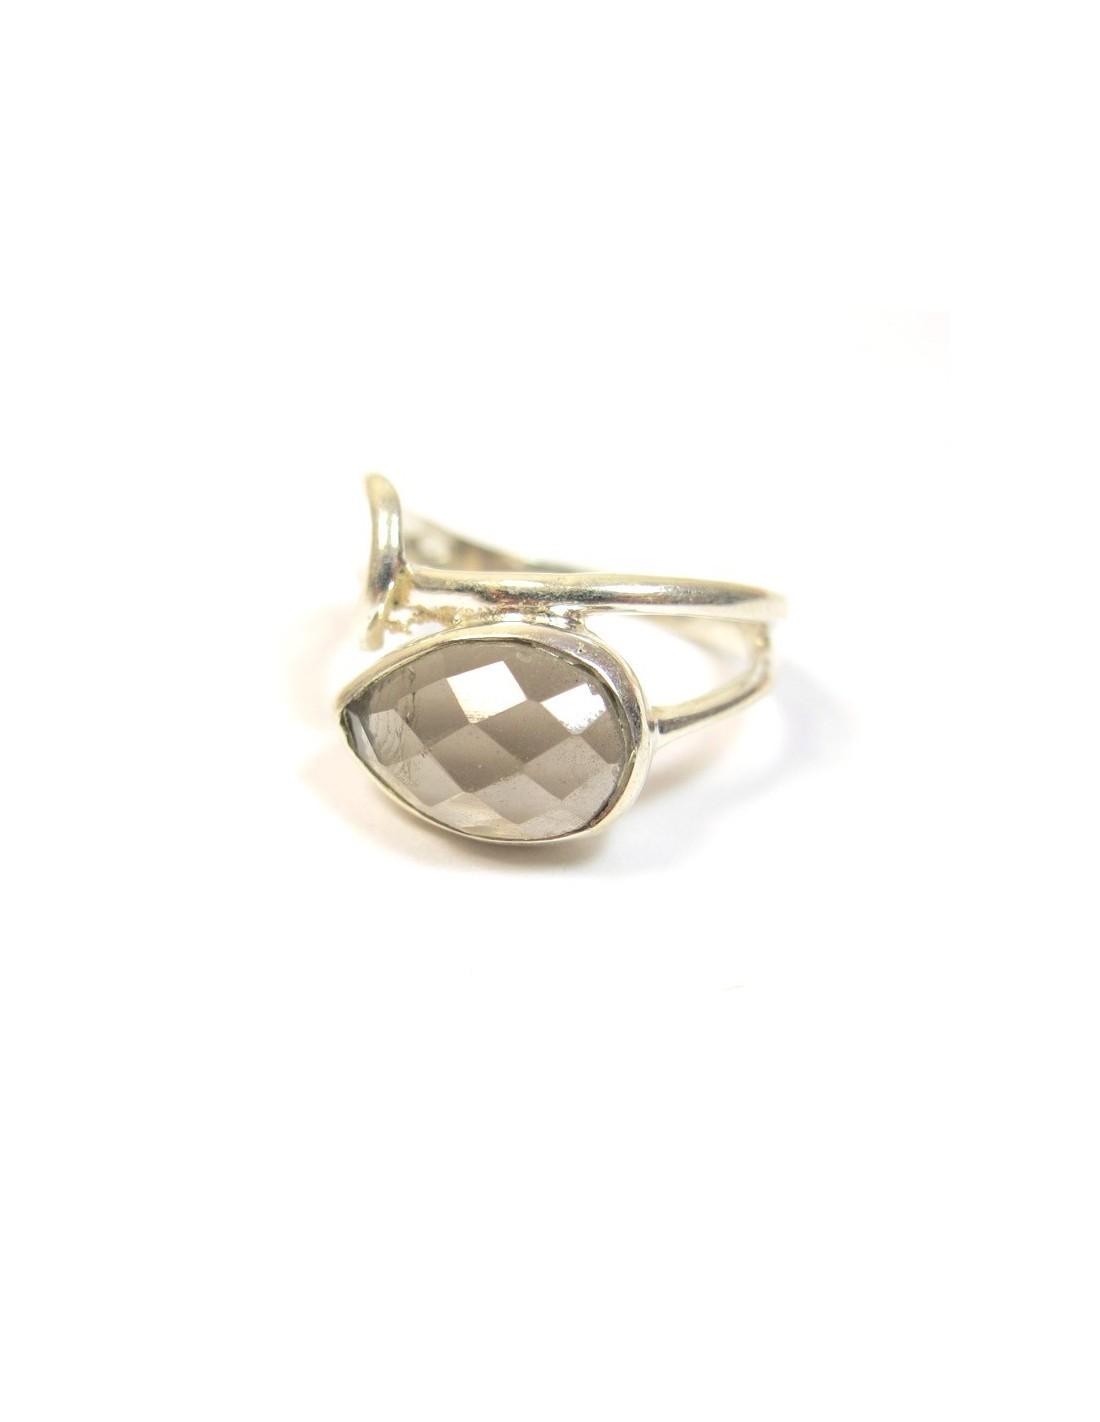 bague argentet quartz fum bijoux fins b604. Black Bedroom Furniture Sets. Home Design Ideas